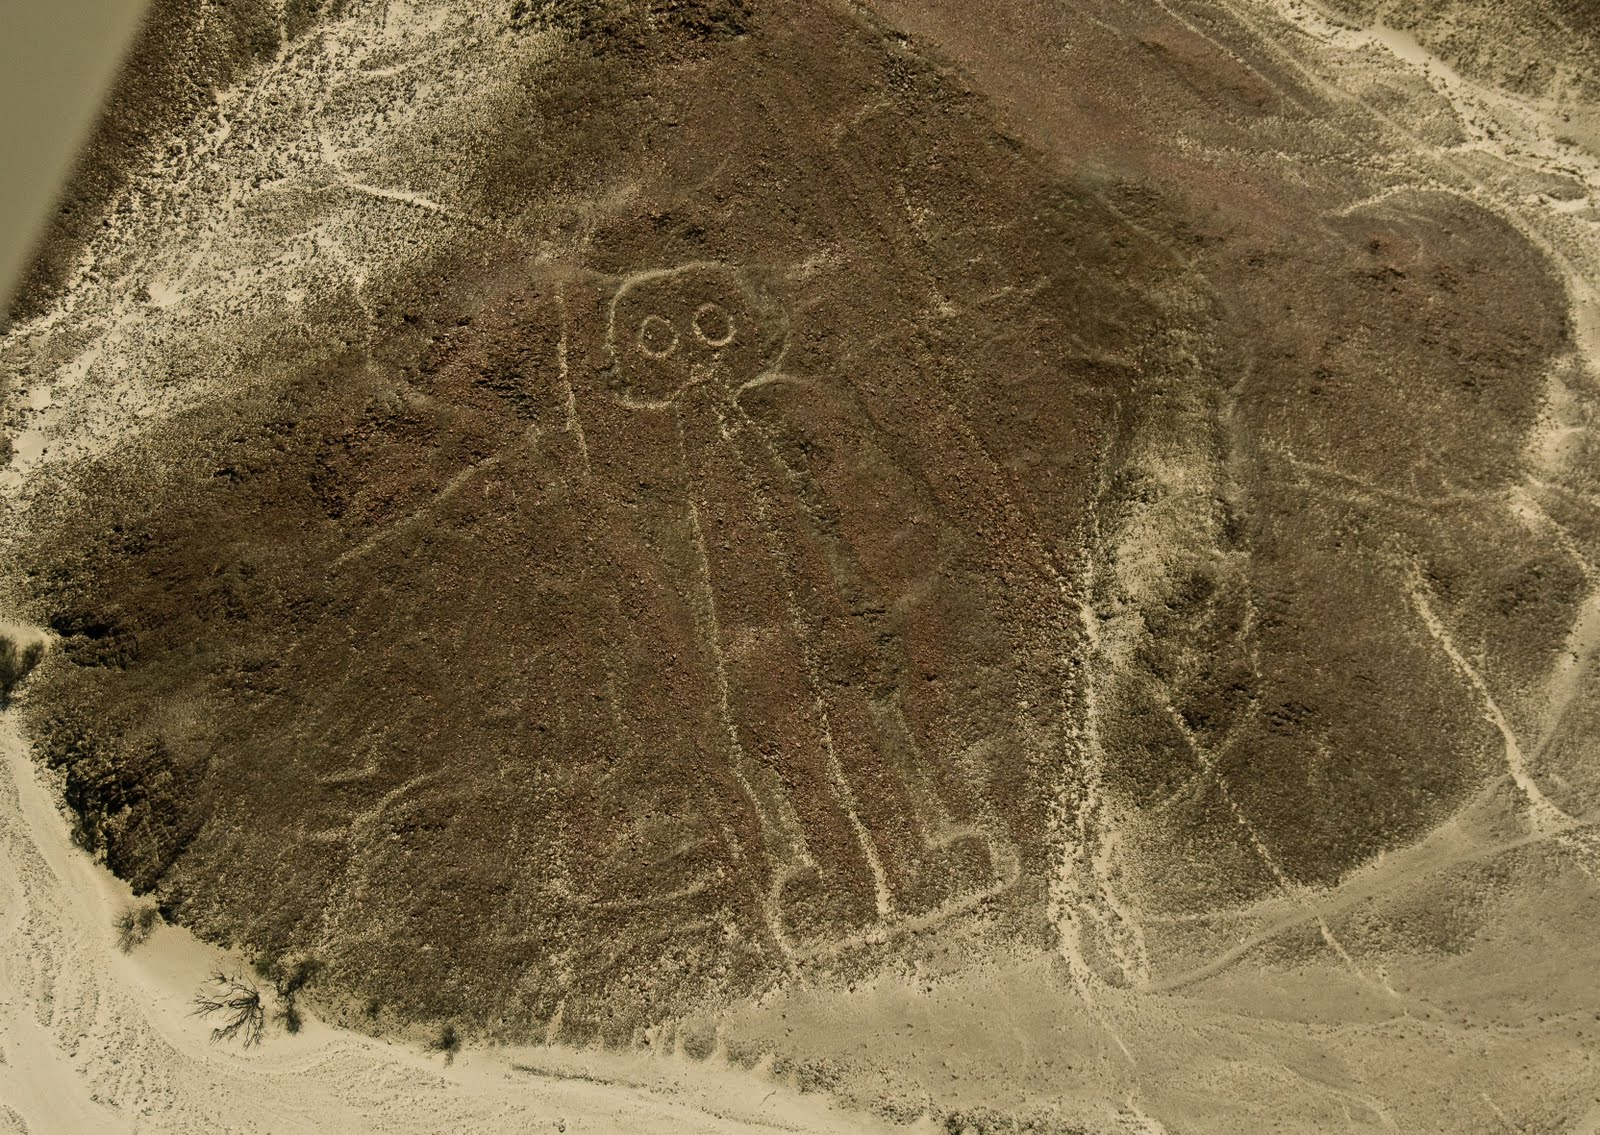 Secrets of drawings on the Nazca plateau 24